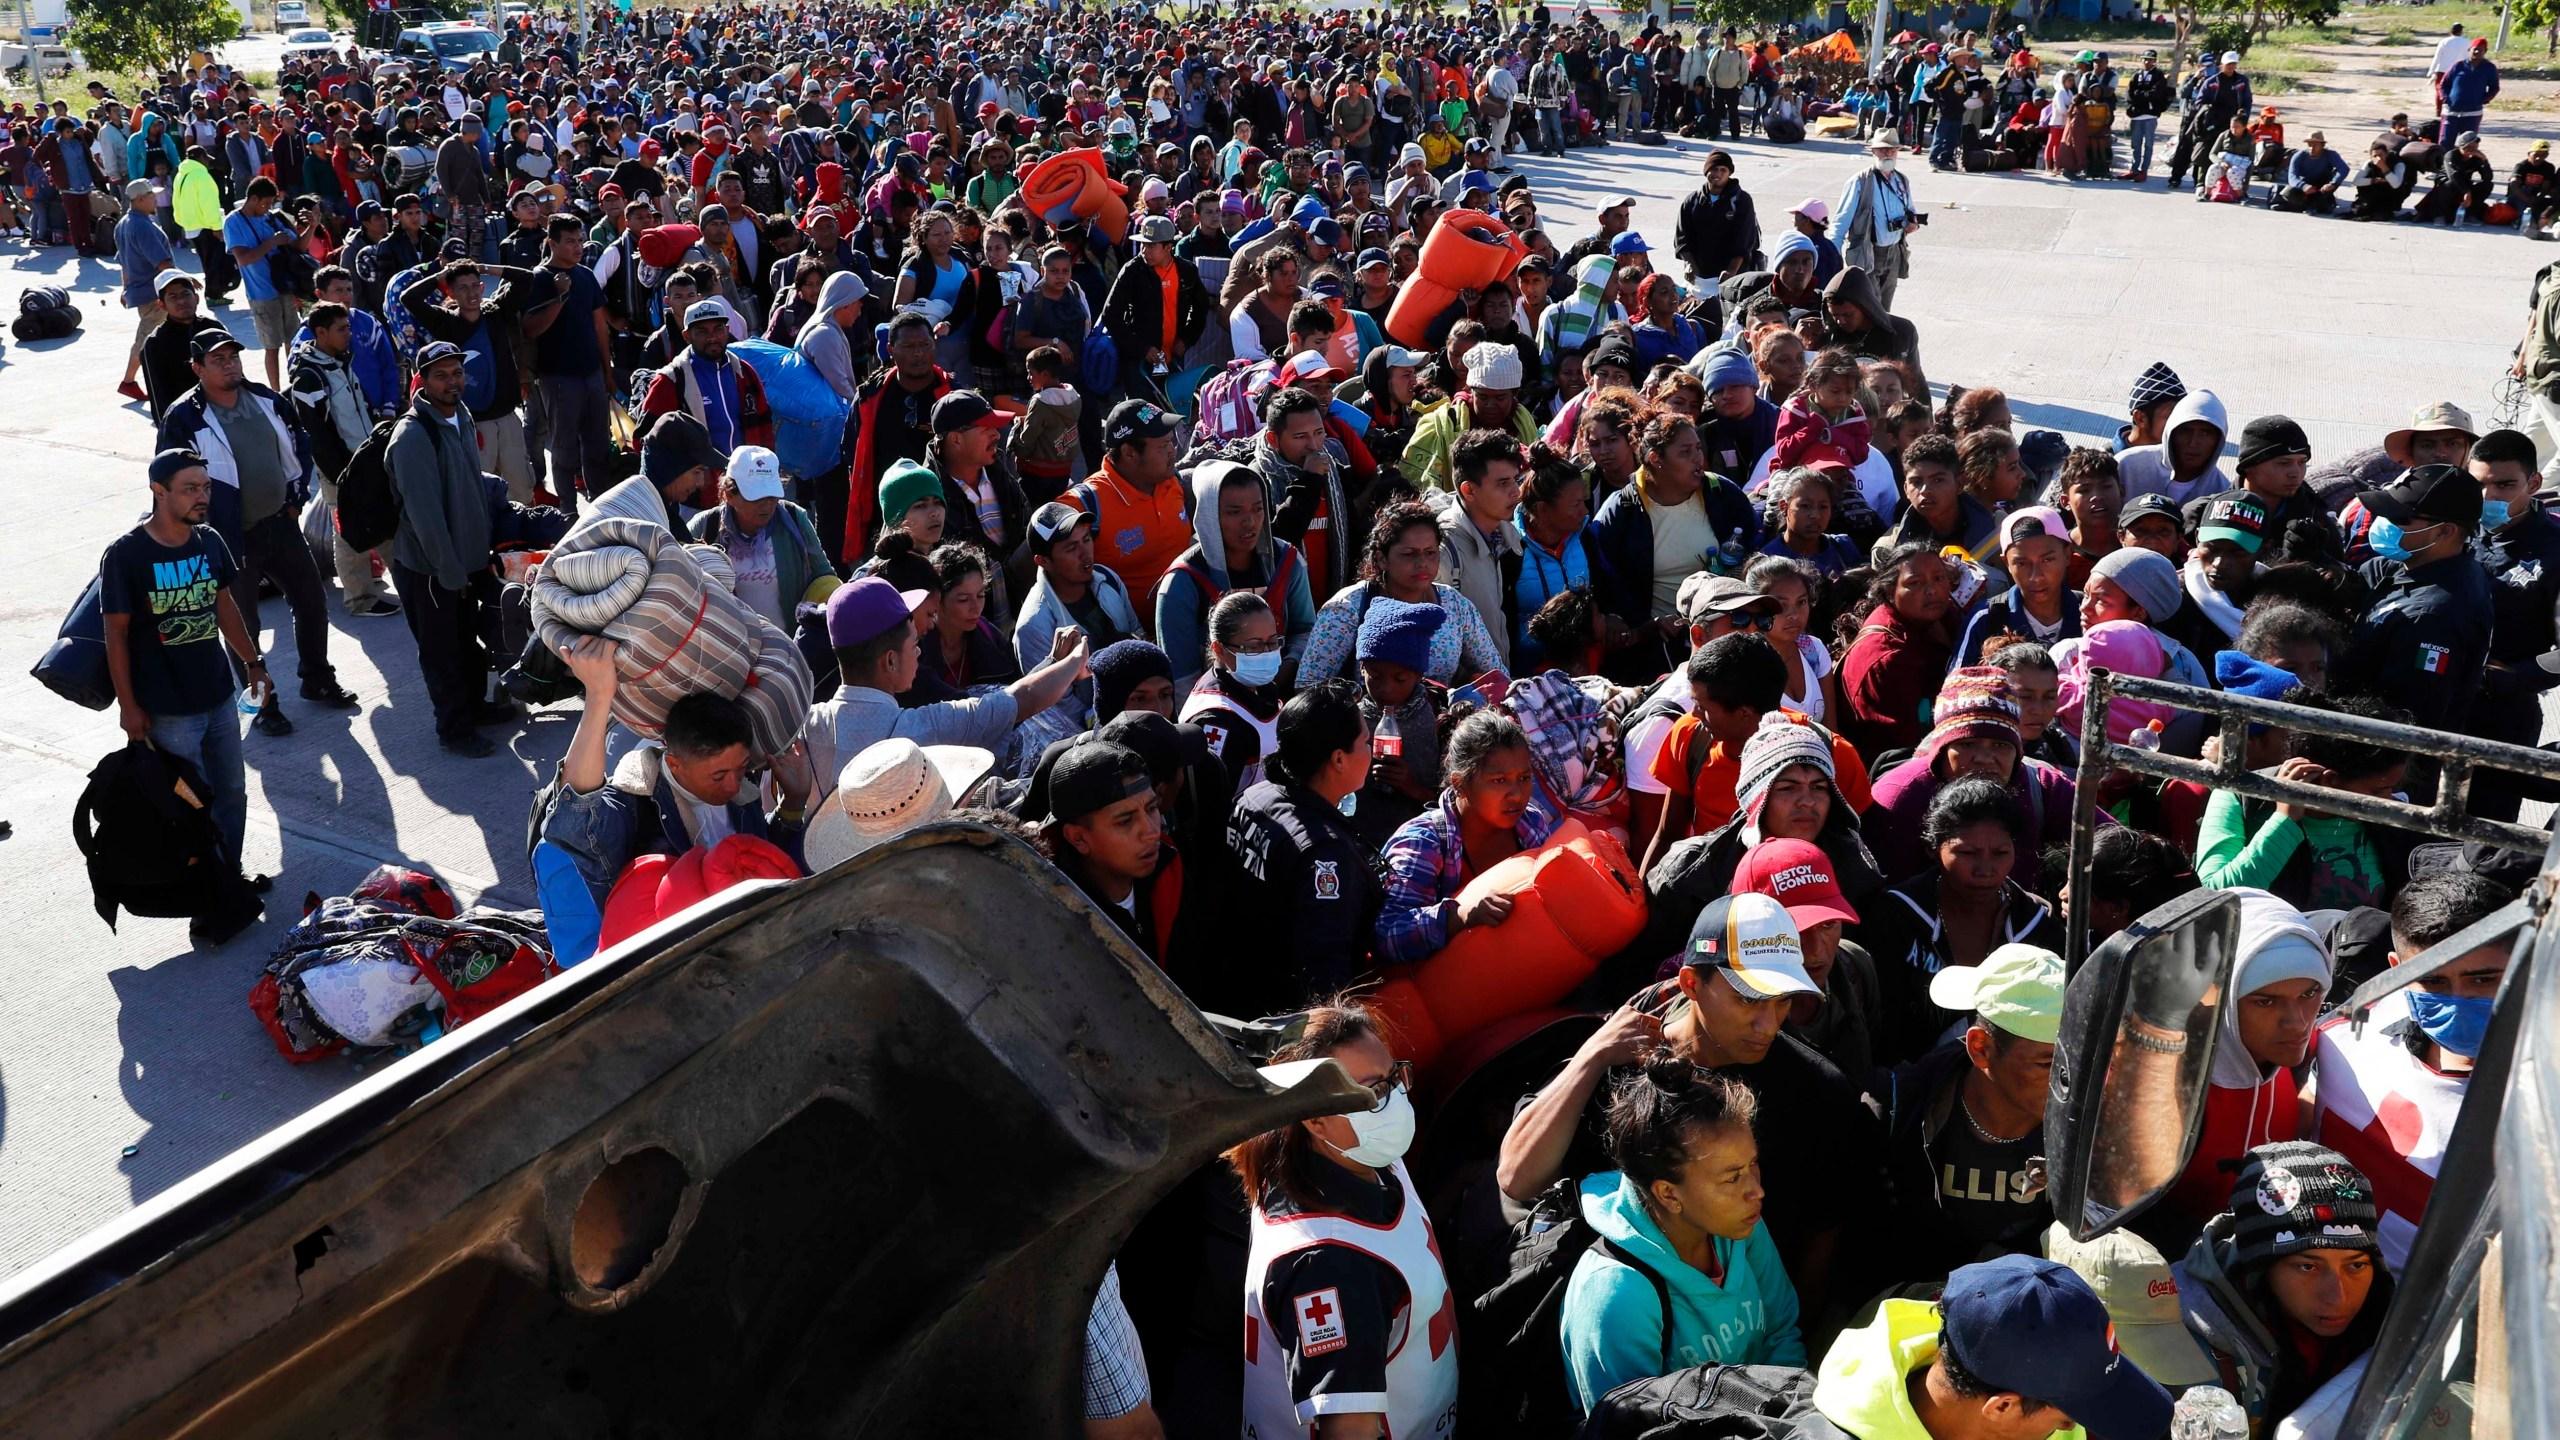 APTOPIX_Central_America_Migrant_Caravan_12597-159532.jpg53435712